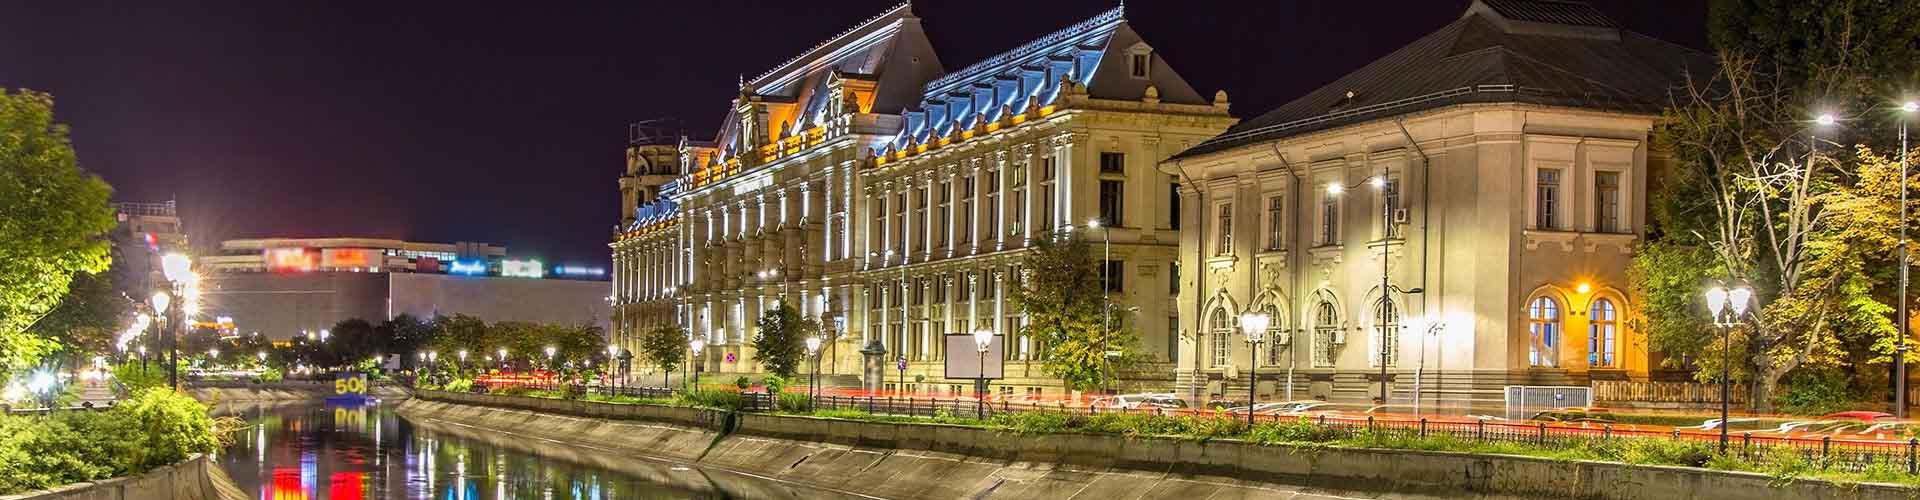 Bucarest - Hostales en Bucarest. Mapas de Bucarest, Fotos y comentarios de cada Hostal en Bucarest.